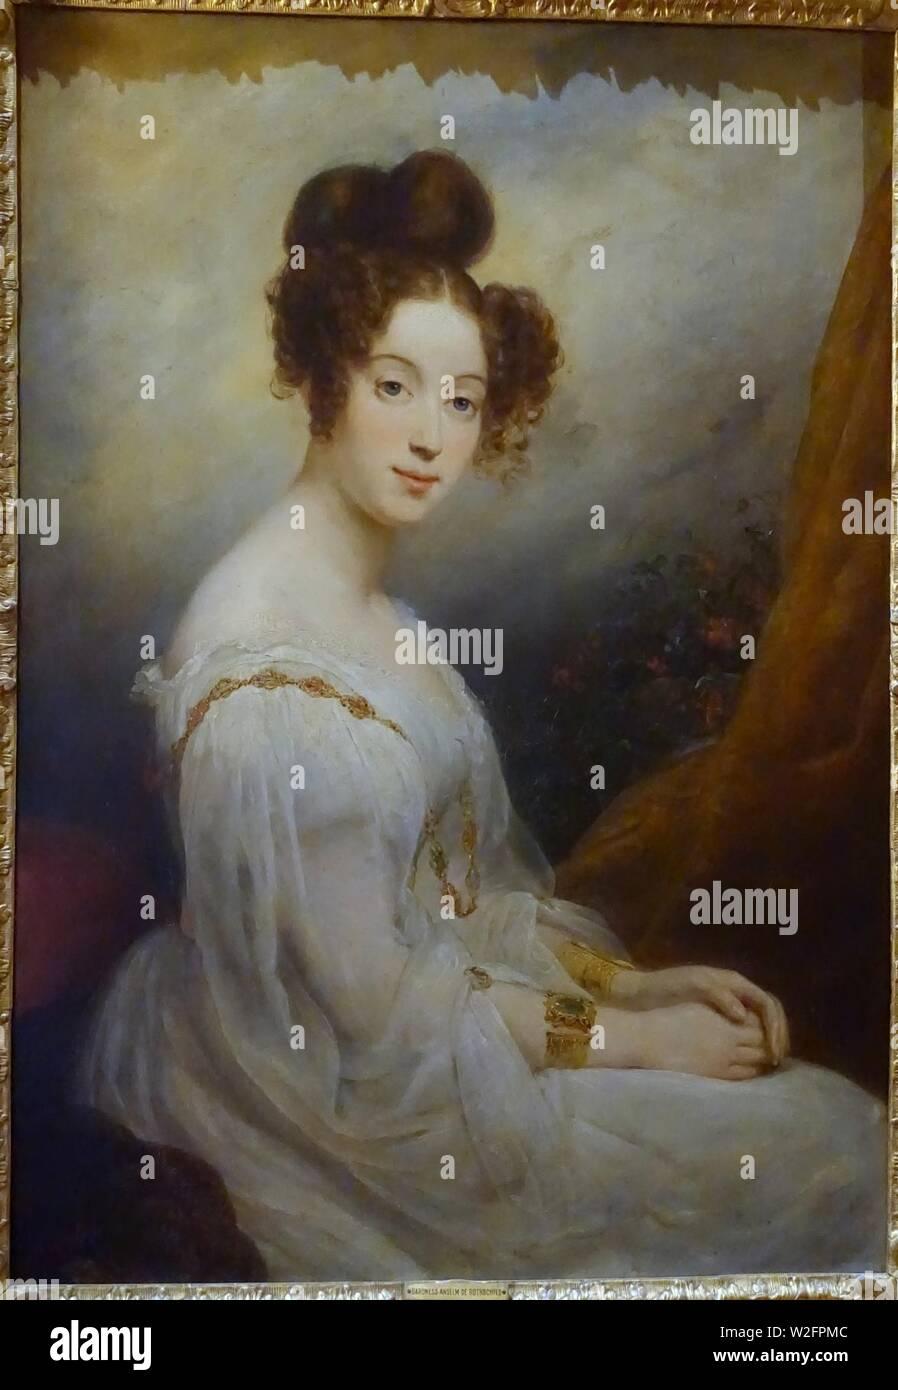 Charlotte, Baroness Anselm de Rothschild, by Ary Scheffer, 1827-1828, oil on canvas - Waddesdon Manor - Buckinghamshire, England - - Stock Image